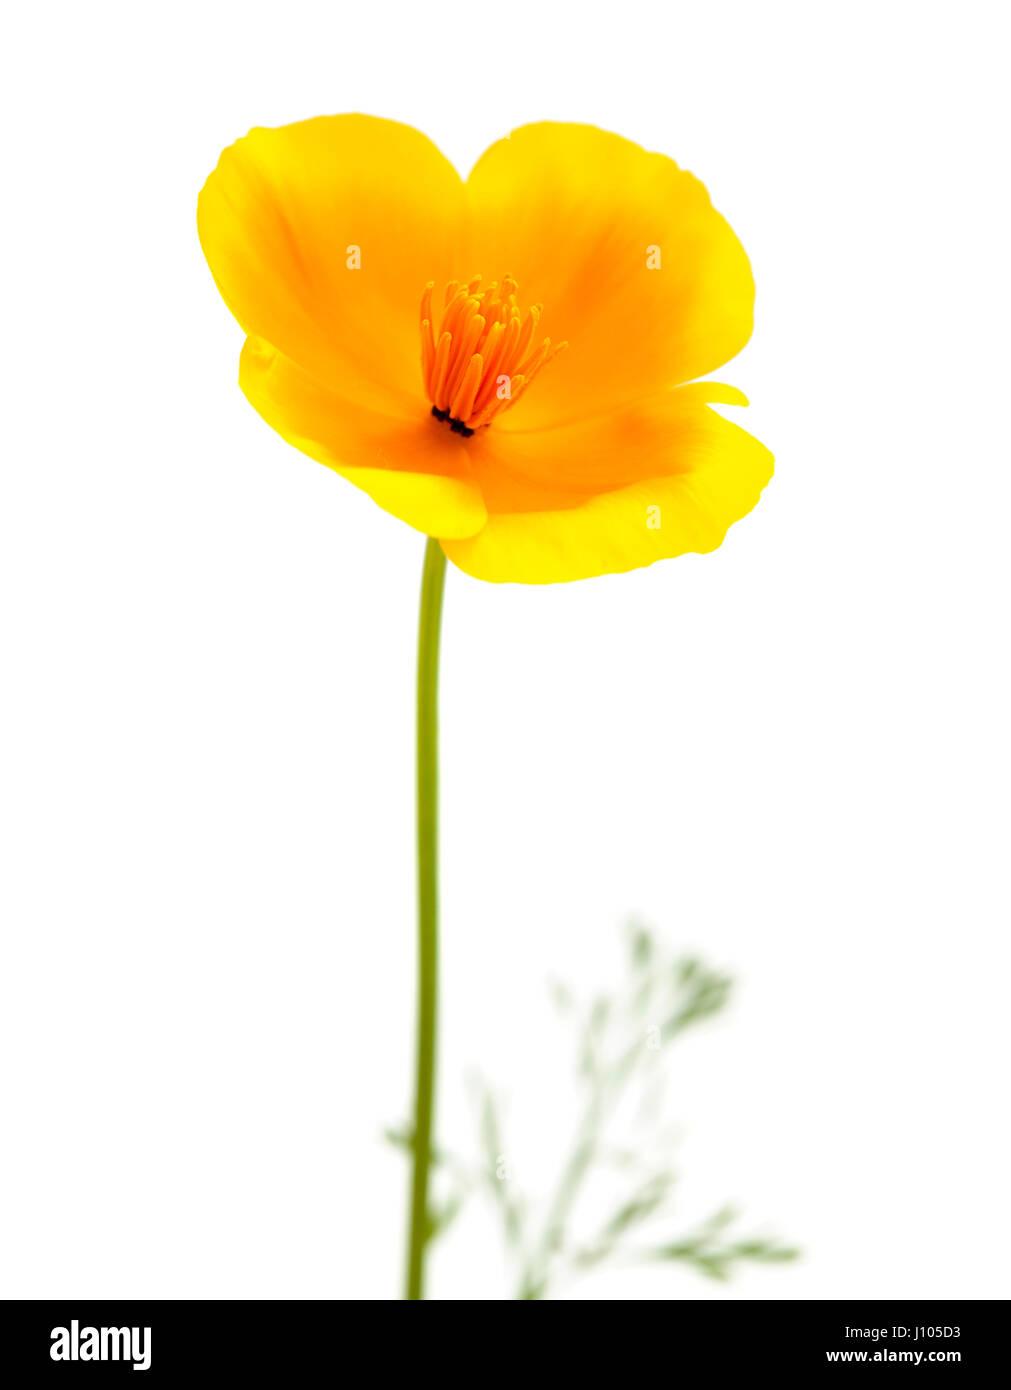 Eschscholzia californica, California poppy isolated on white - Stock Image